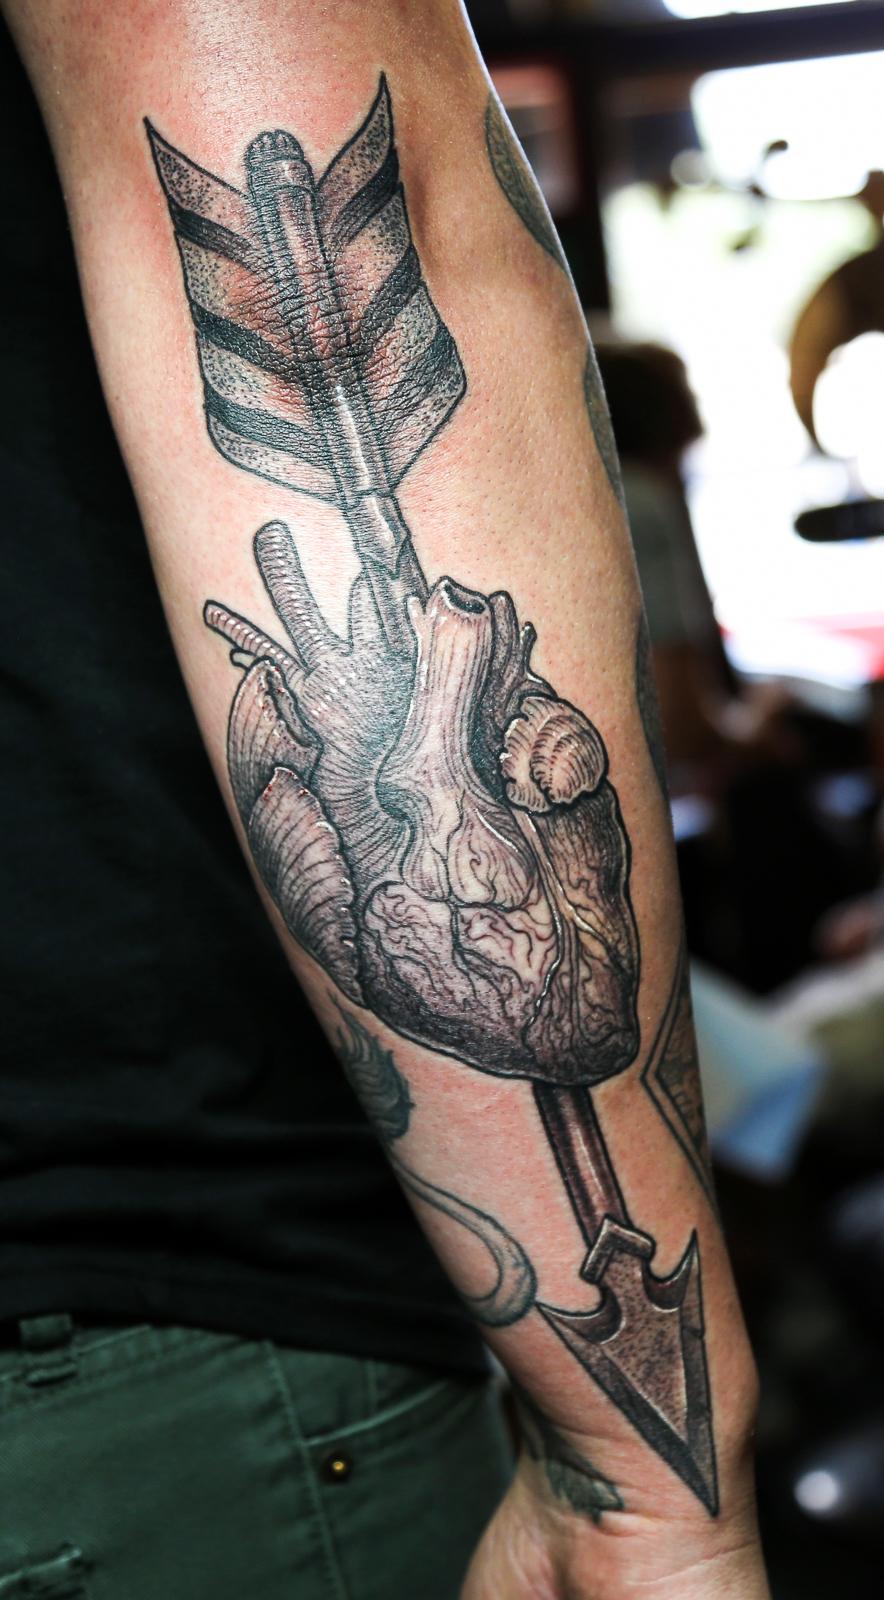 heart with arrow 1 enrique bernal ejay tattoo.jpg